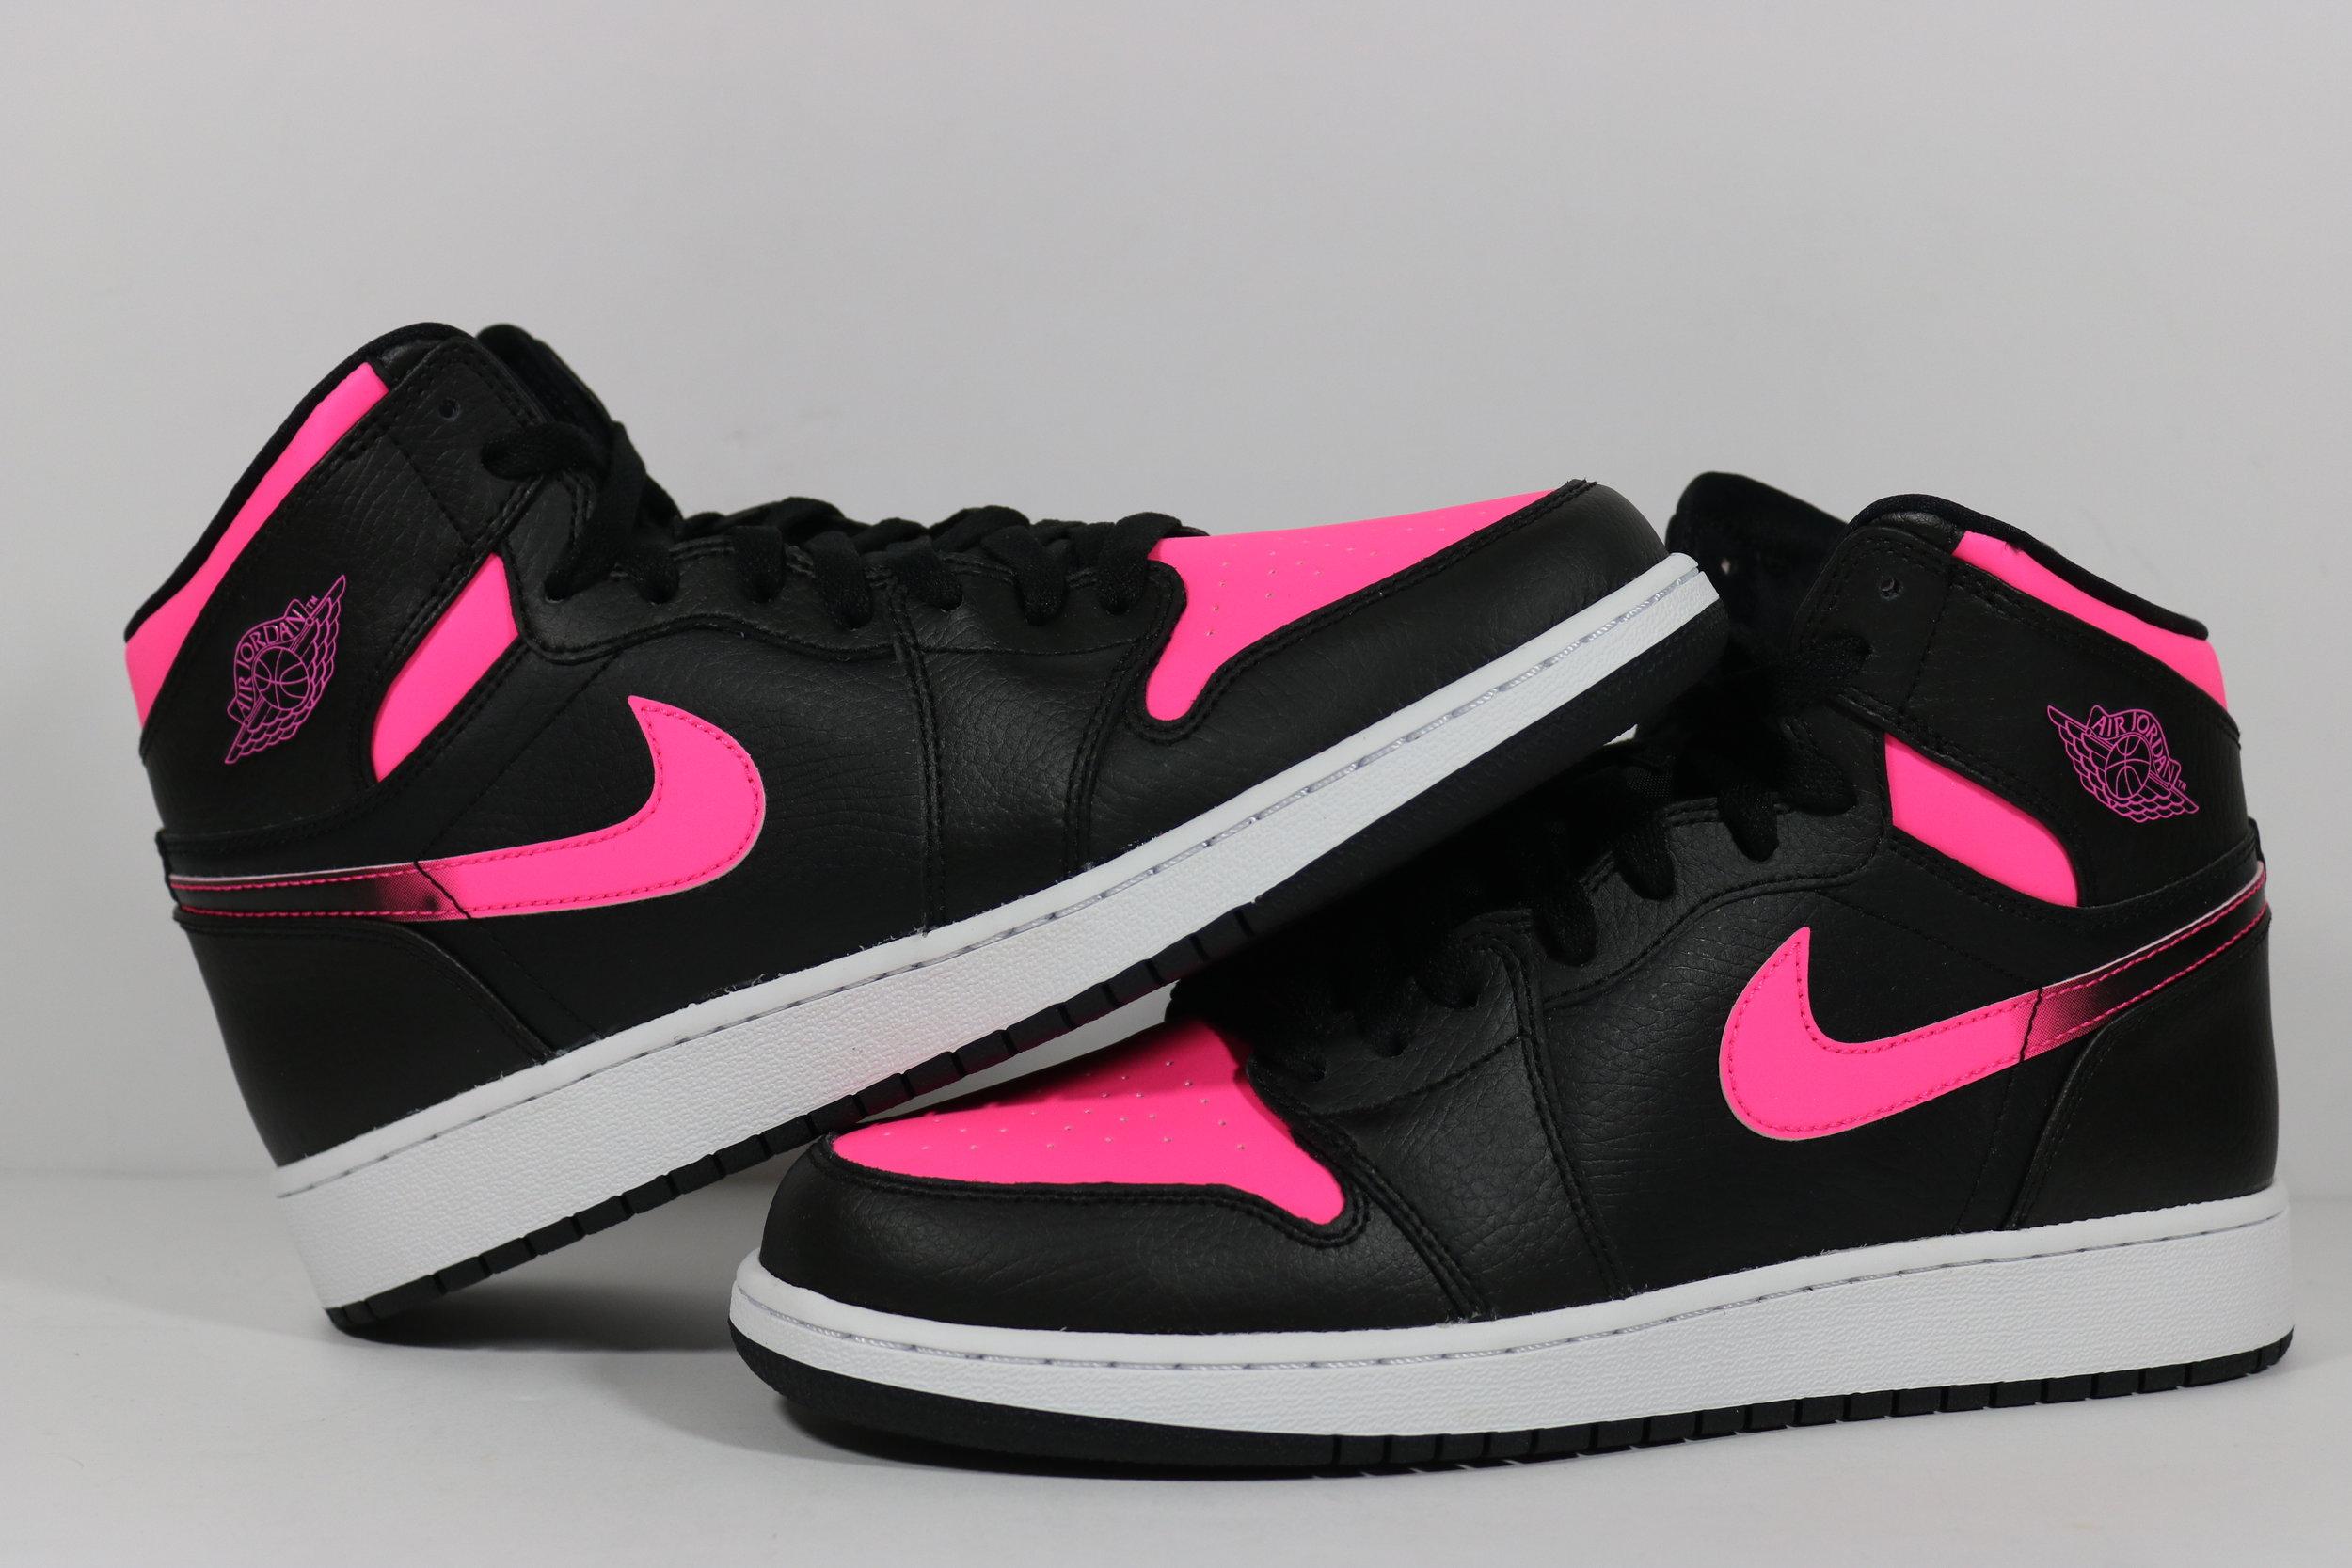 girls nike air jordan 1 retro high gs hyper pink size 8y 332148 019 1. eac4780ba